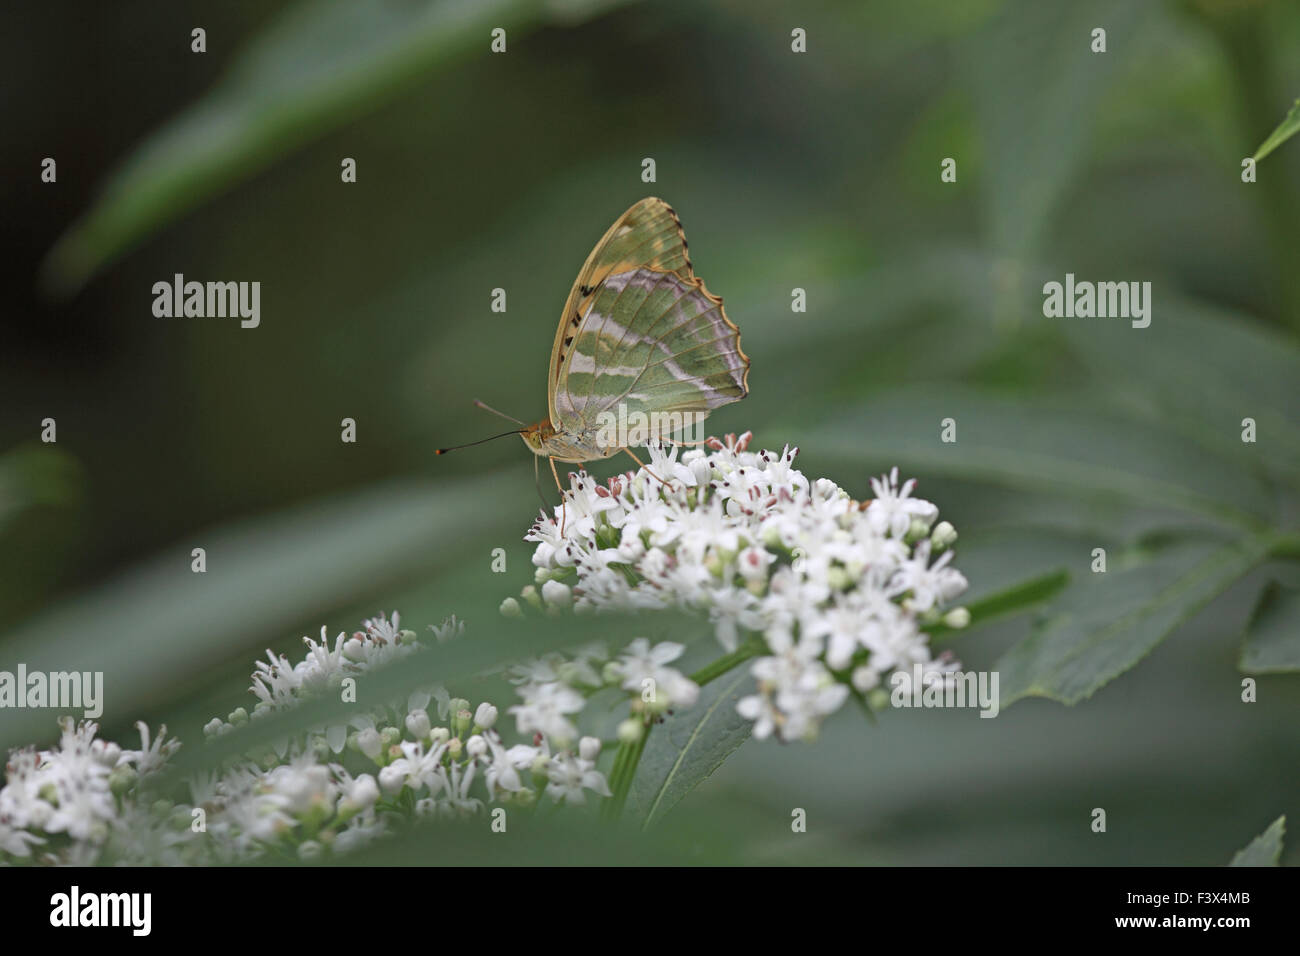 Male on scrub elder wings closed Hungary June 2015 - Stock Image